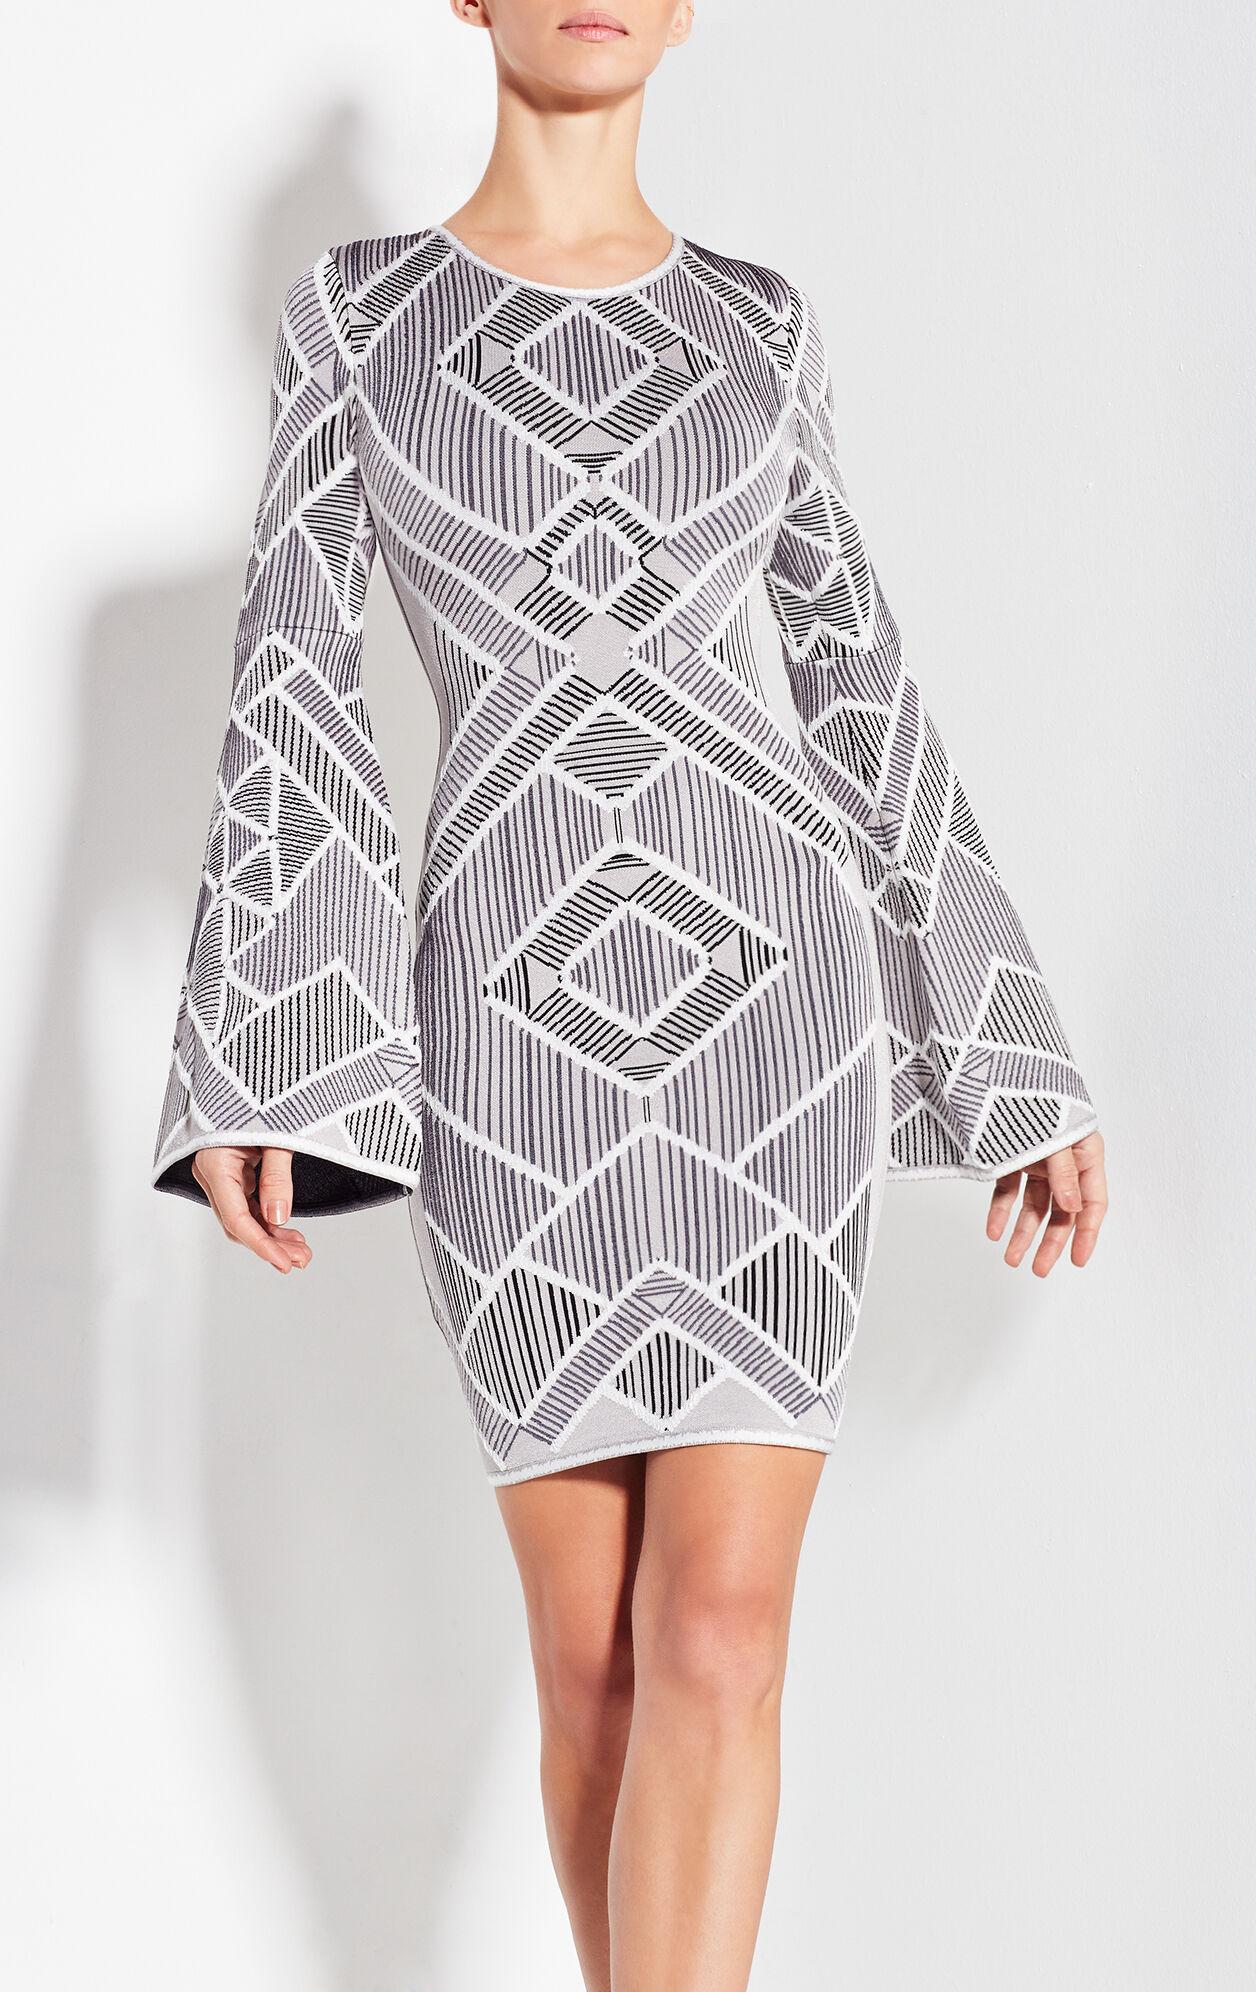 Skyler Diagonal Multicolored Macrame Dress